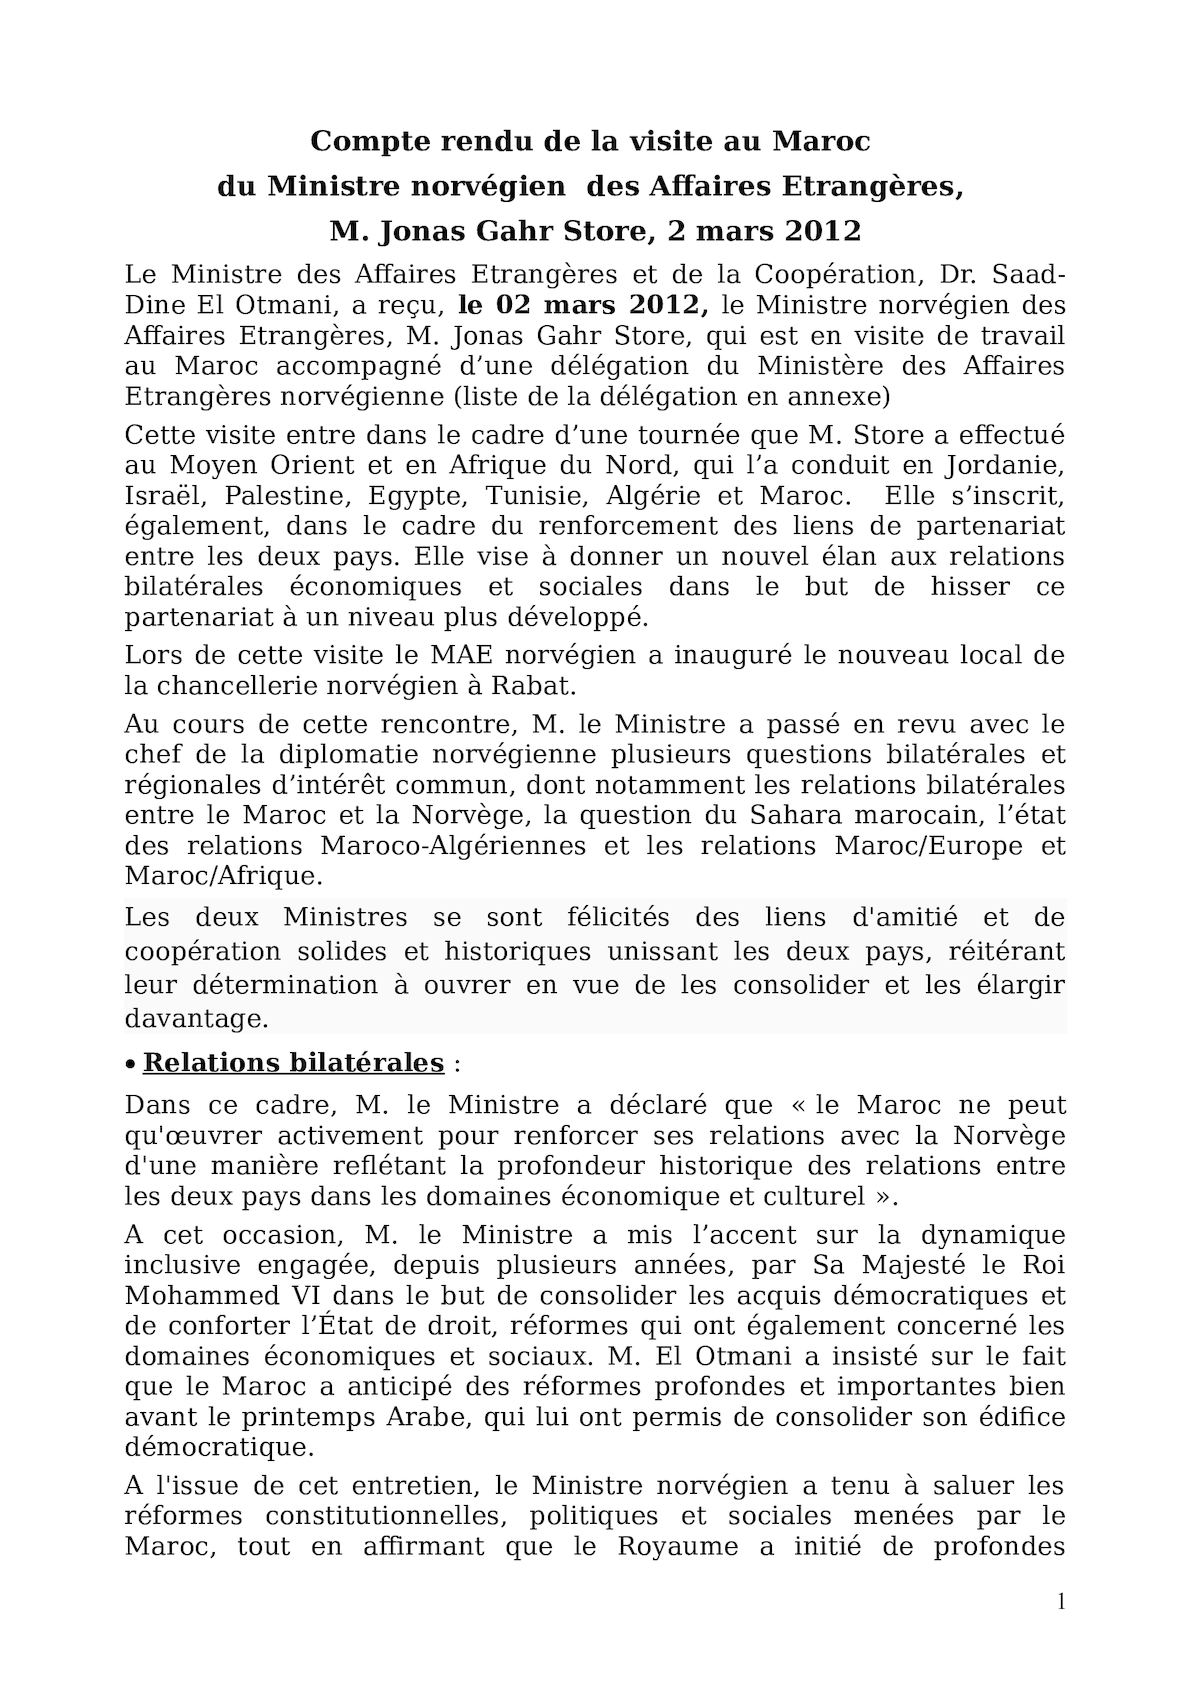 Compte Rendu Viste Maroc Mae Norvegien5mars2012